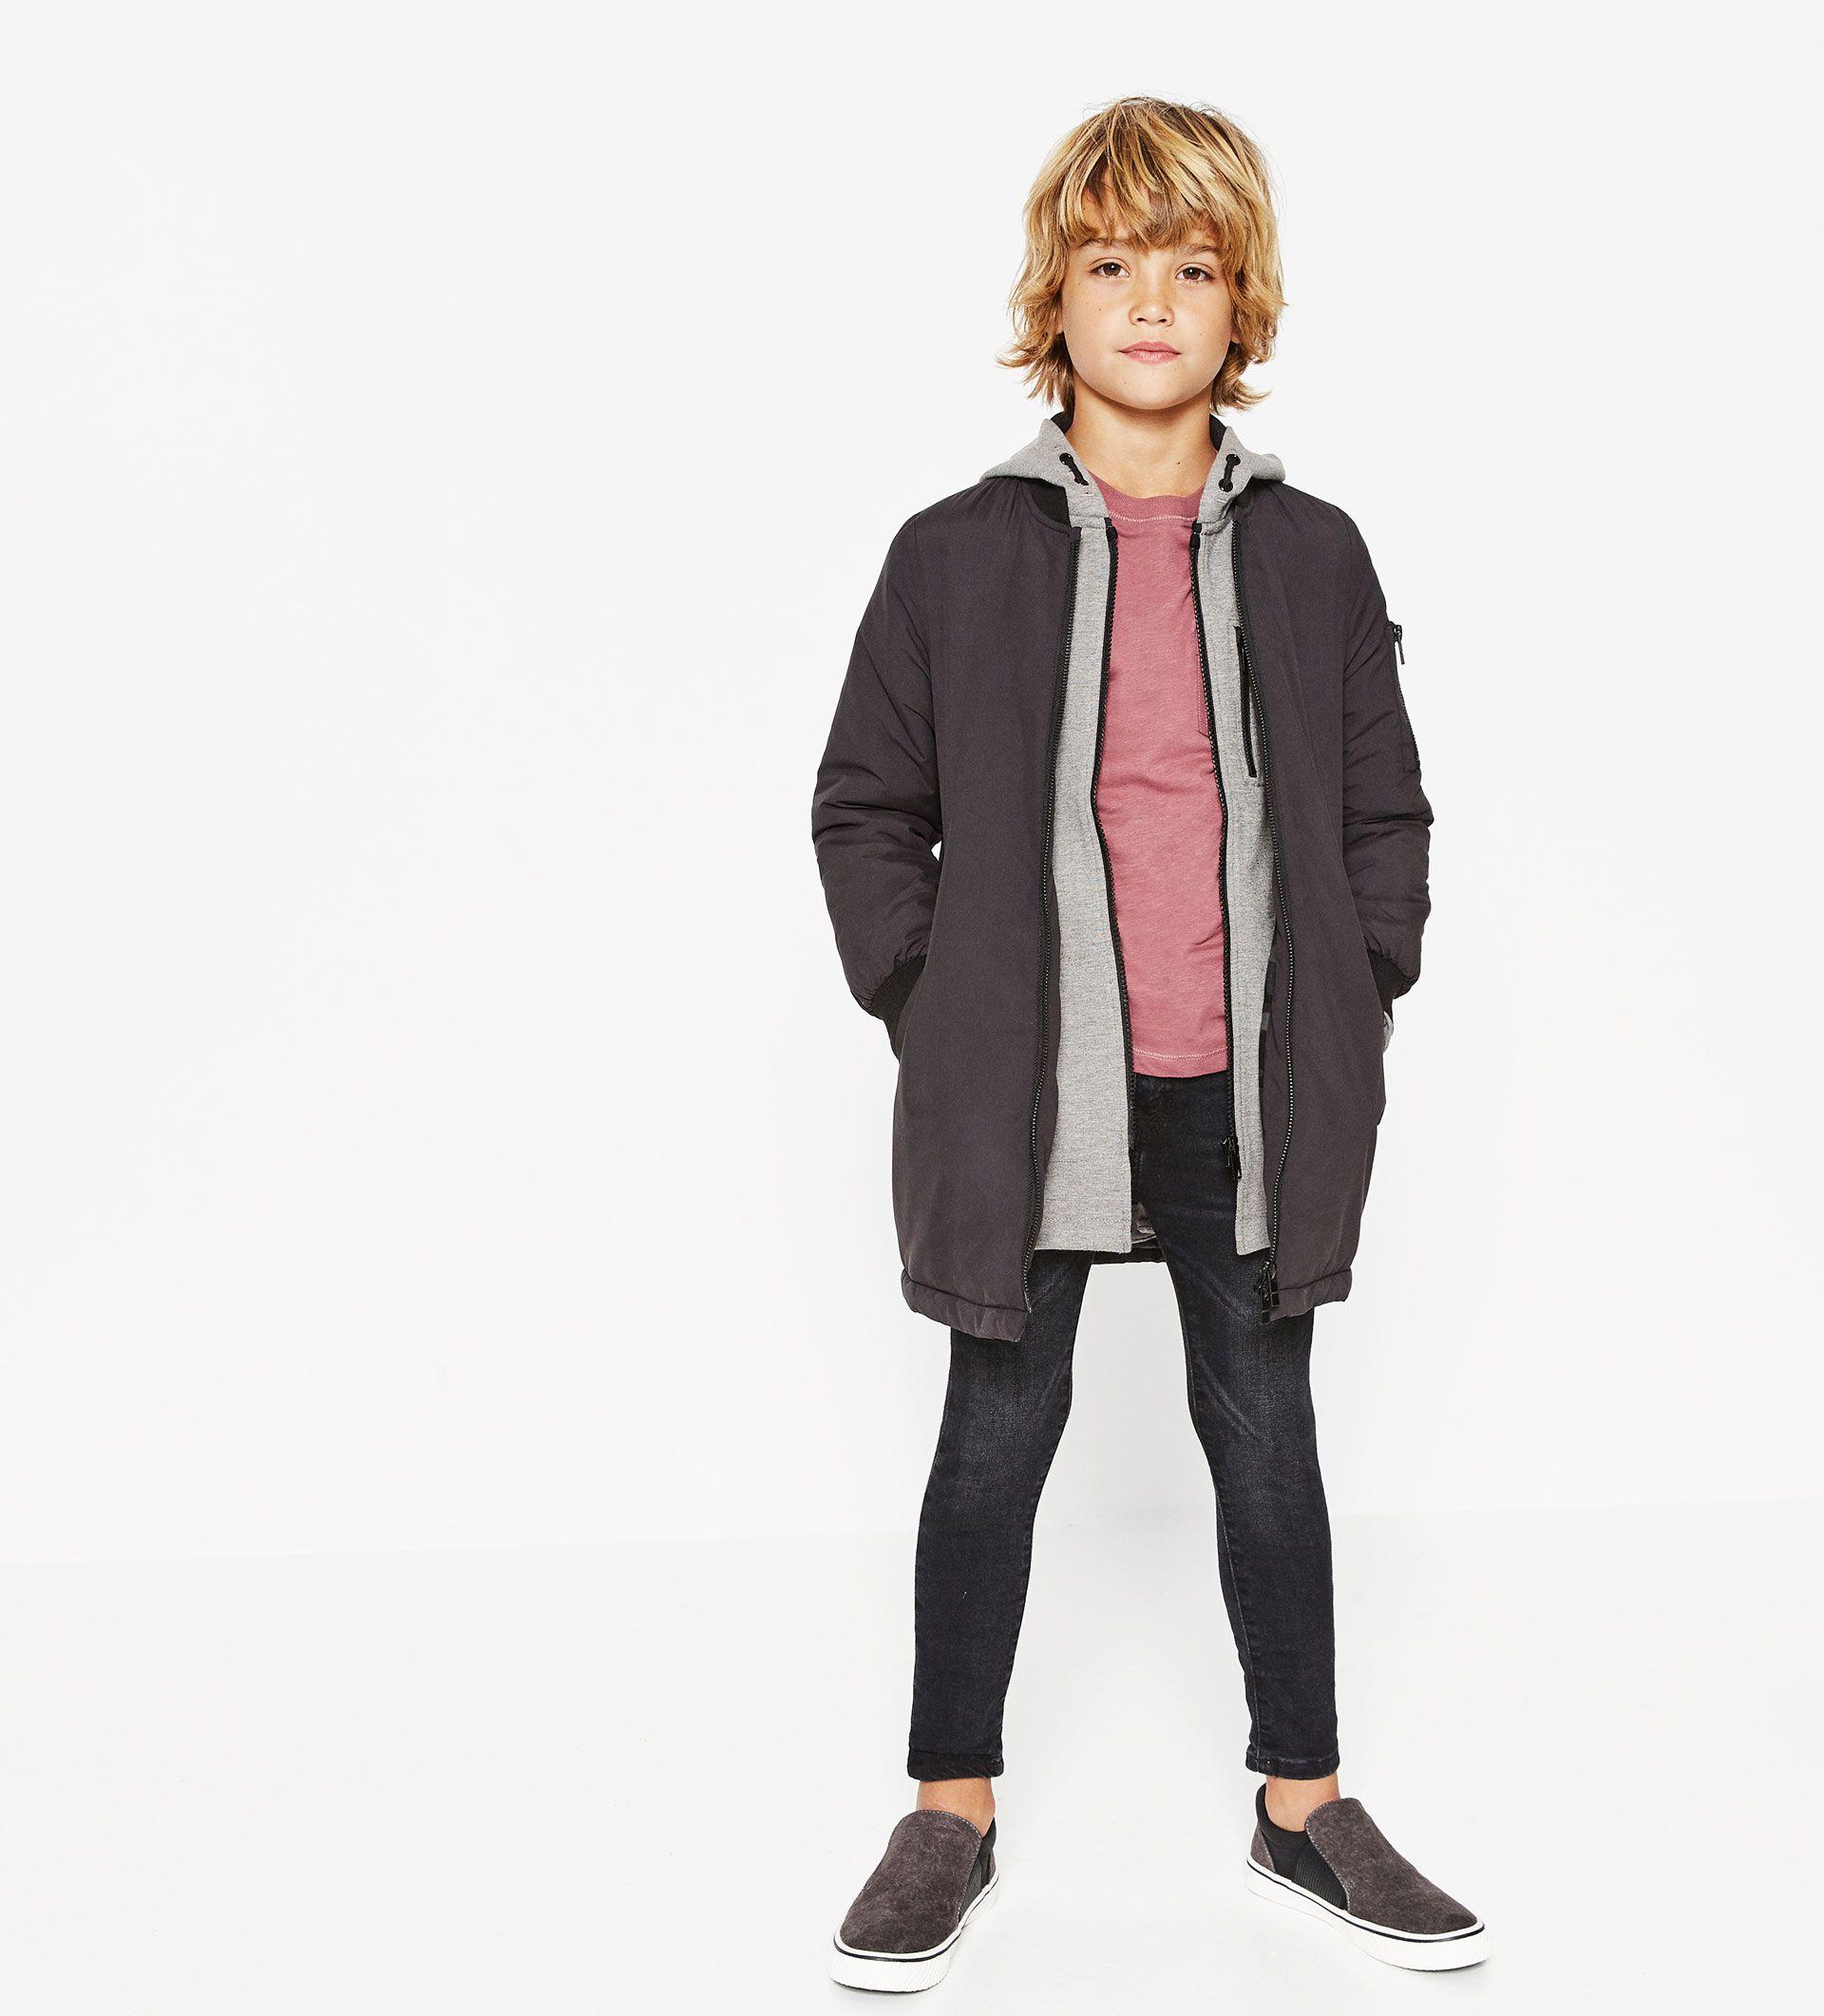 Kjop Etter Stil Gutt Barn Zara Norge Long Bomber Jacket Kids Fashion Photography Kids Fashion Boy [ 2122 x 1920 Pixel ]